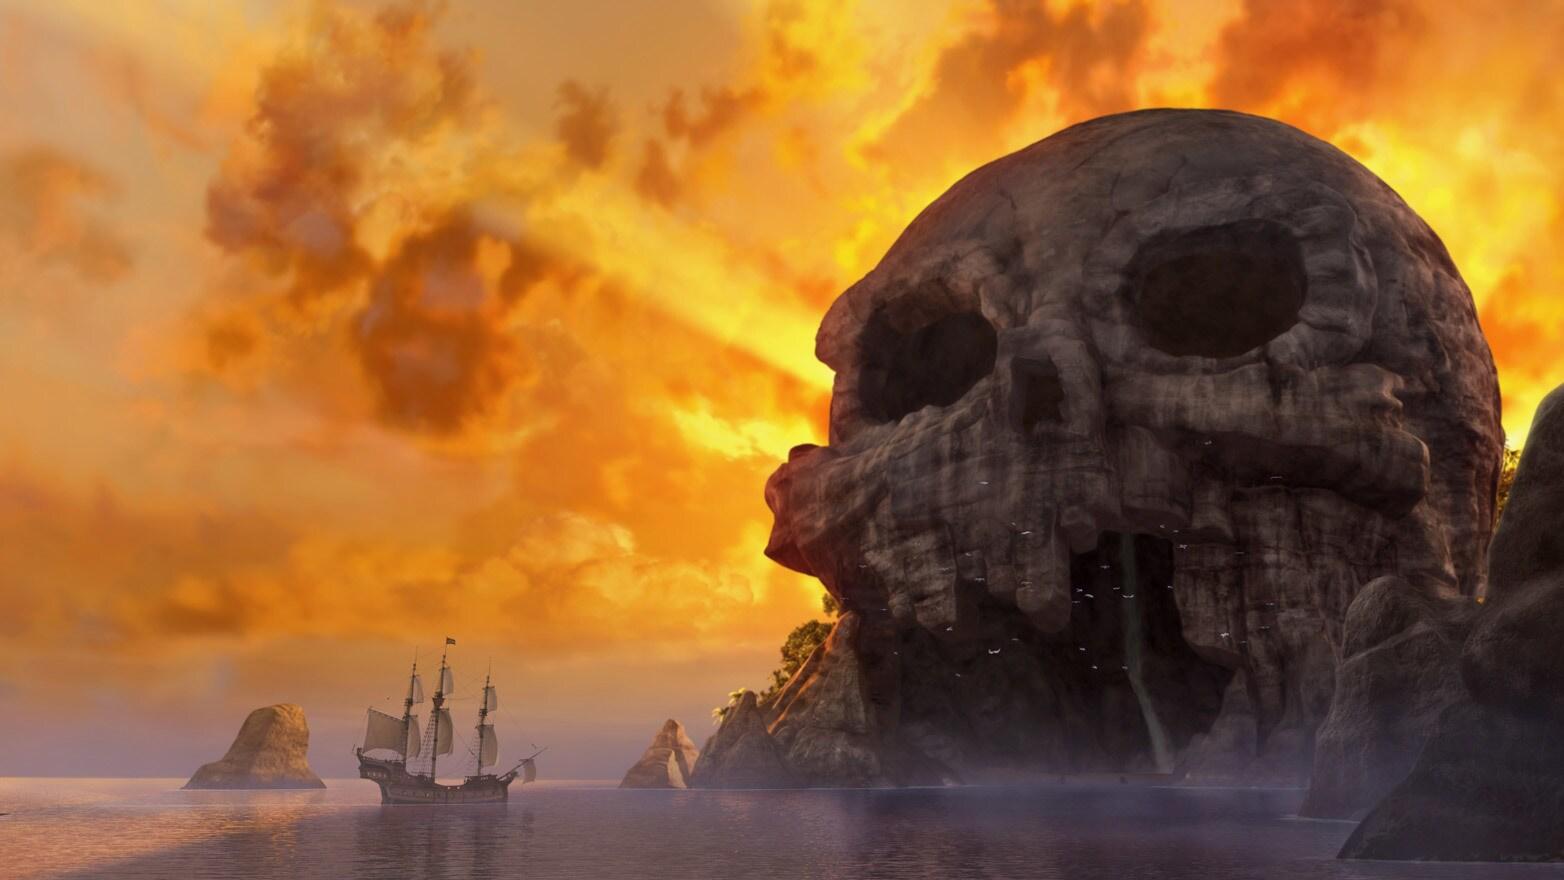 The iconic landmark in Neverland.